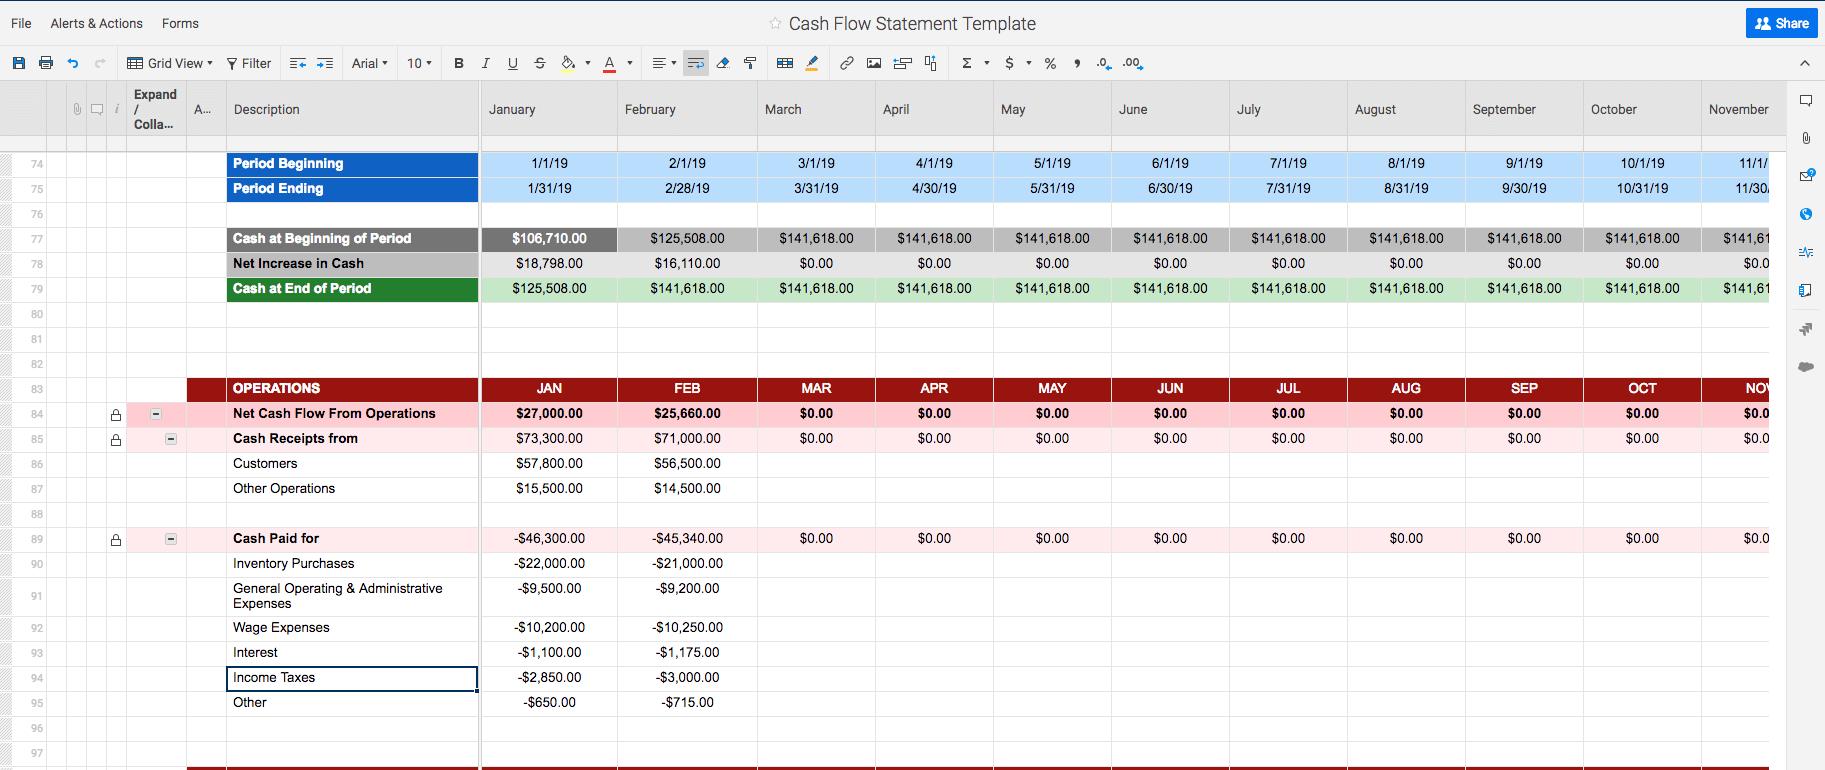 Free Cash Flow Statement Templates  Smartsheet With Cash Position Report Template